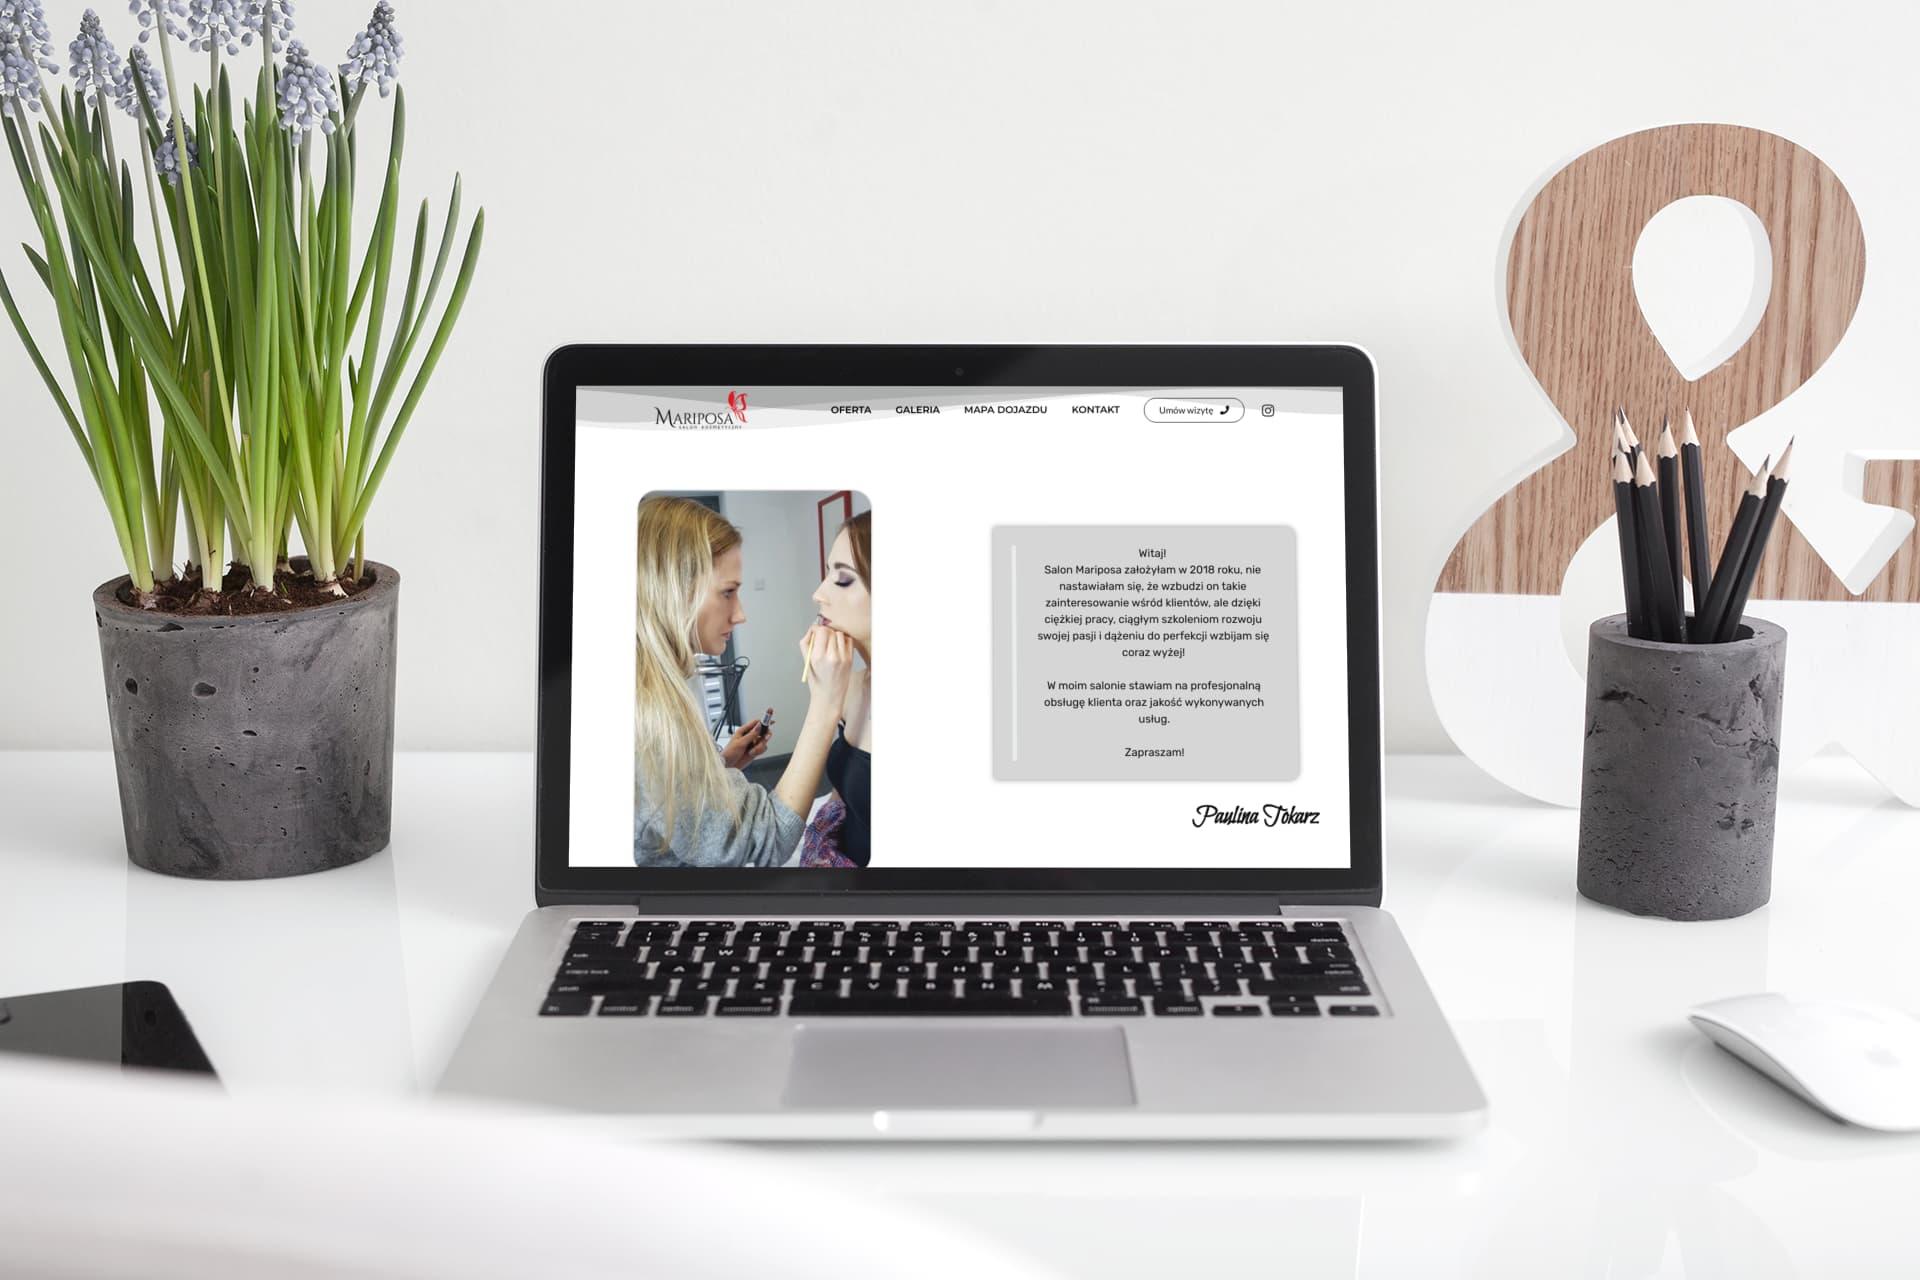 mariposa desktop 1